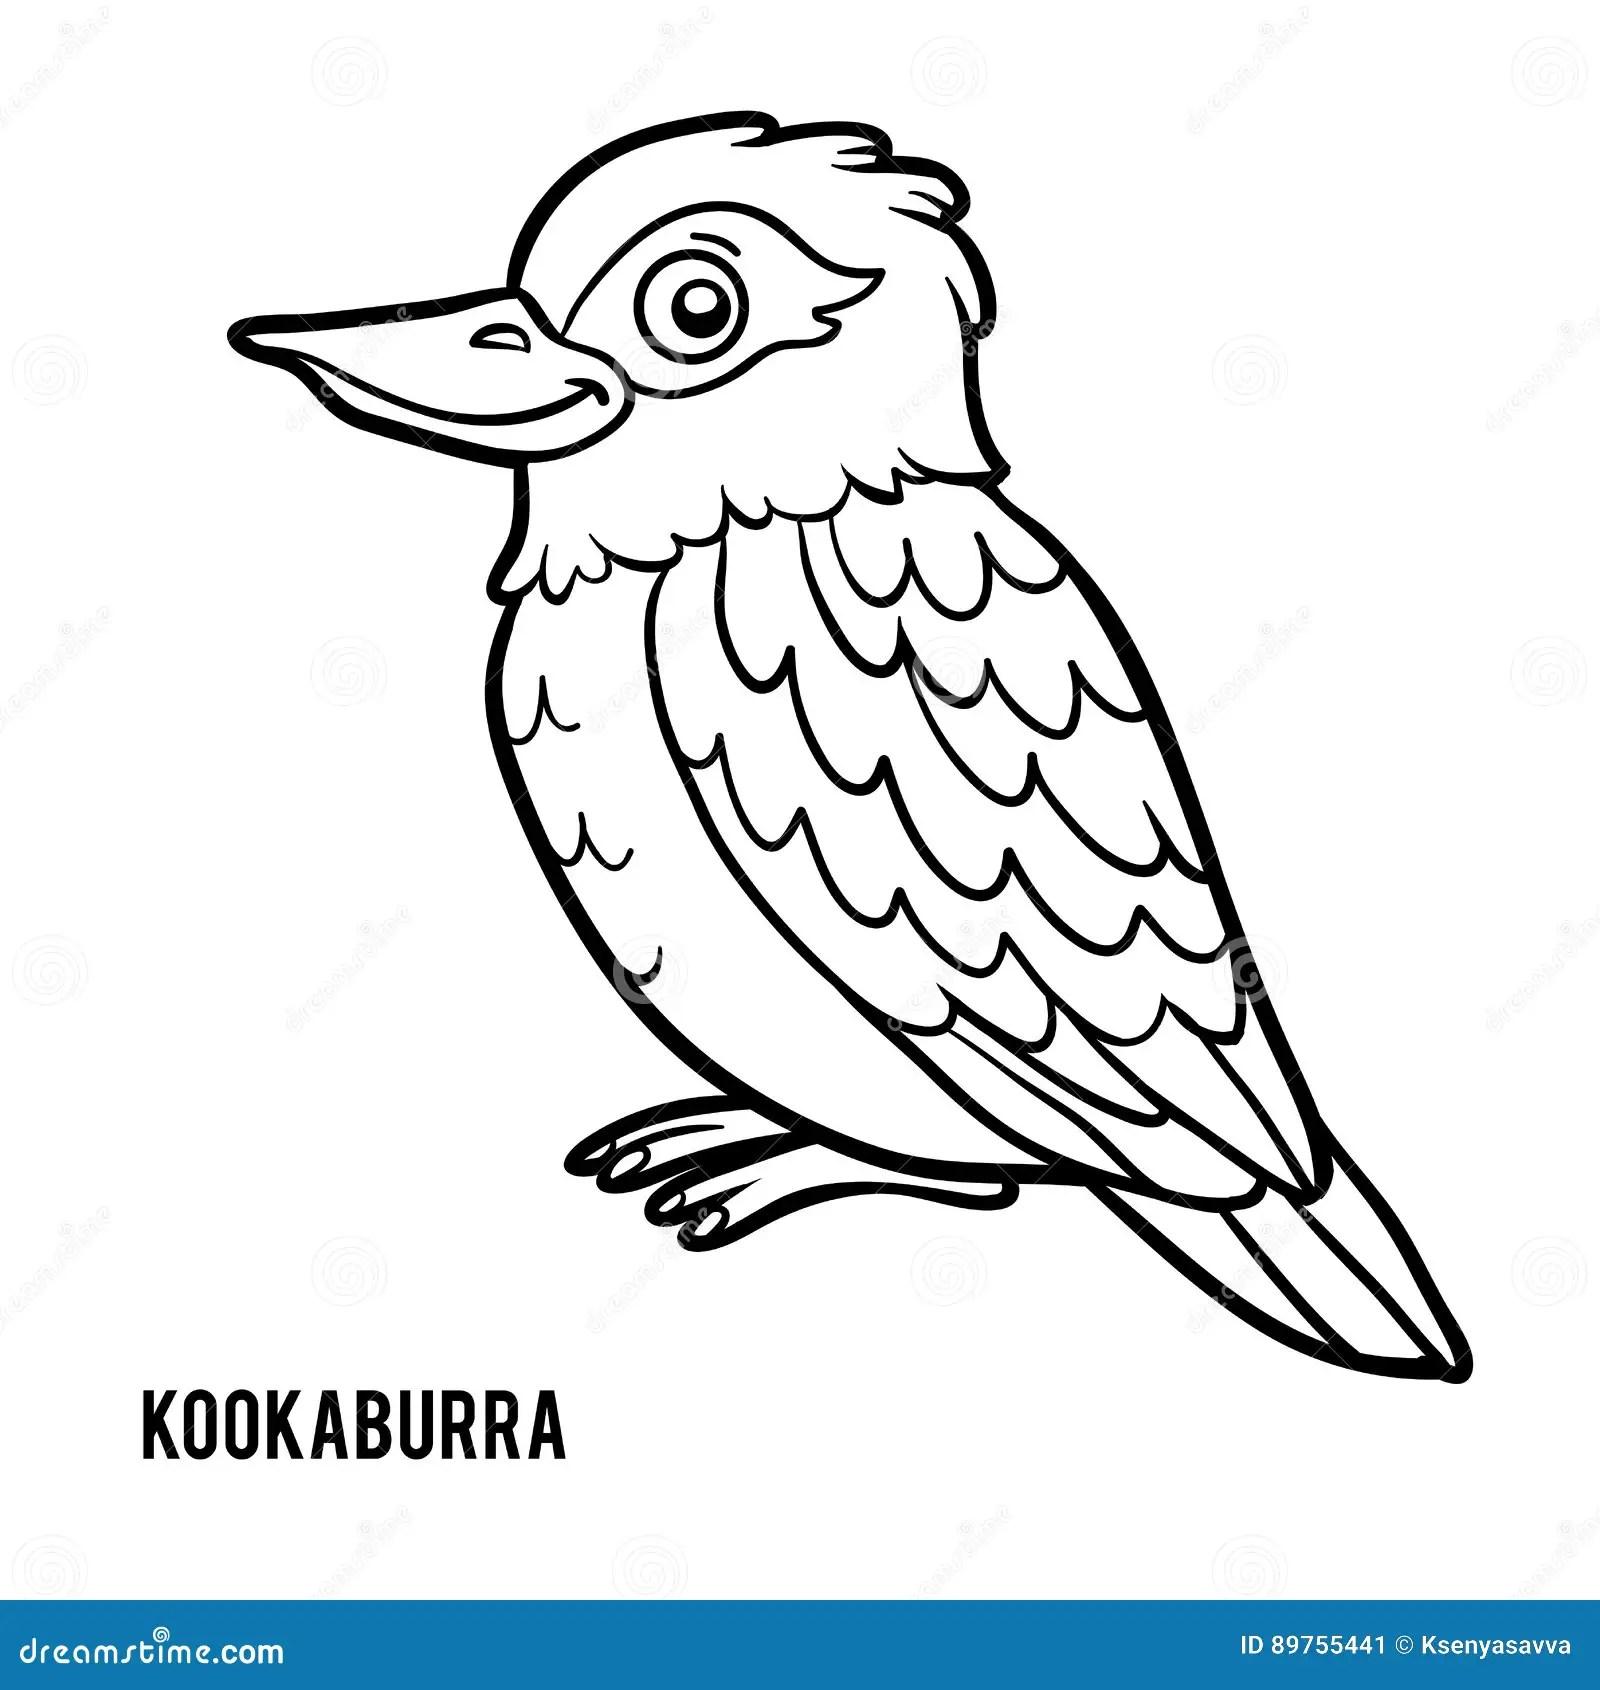 Coloring Book Kookaburra Stock Vector Illustration Of